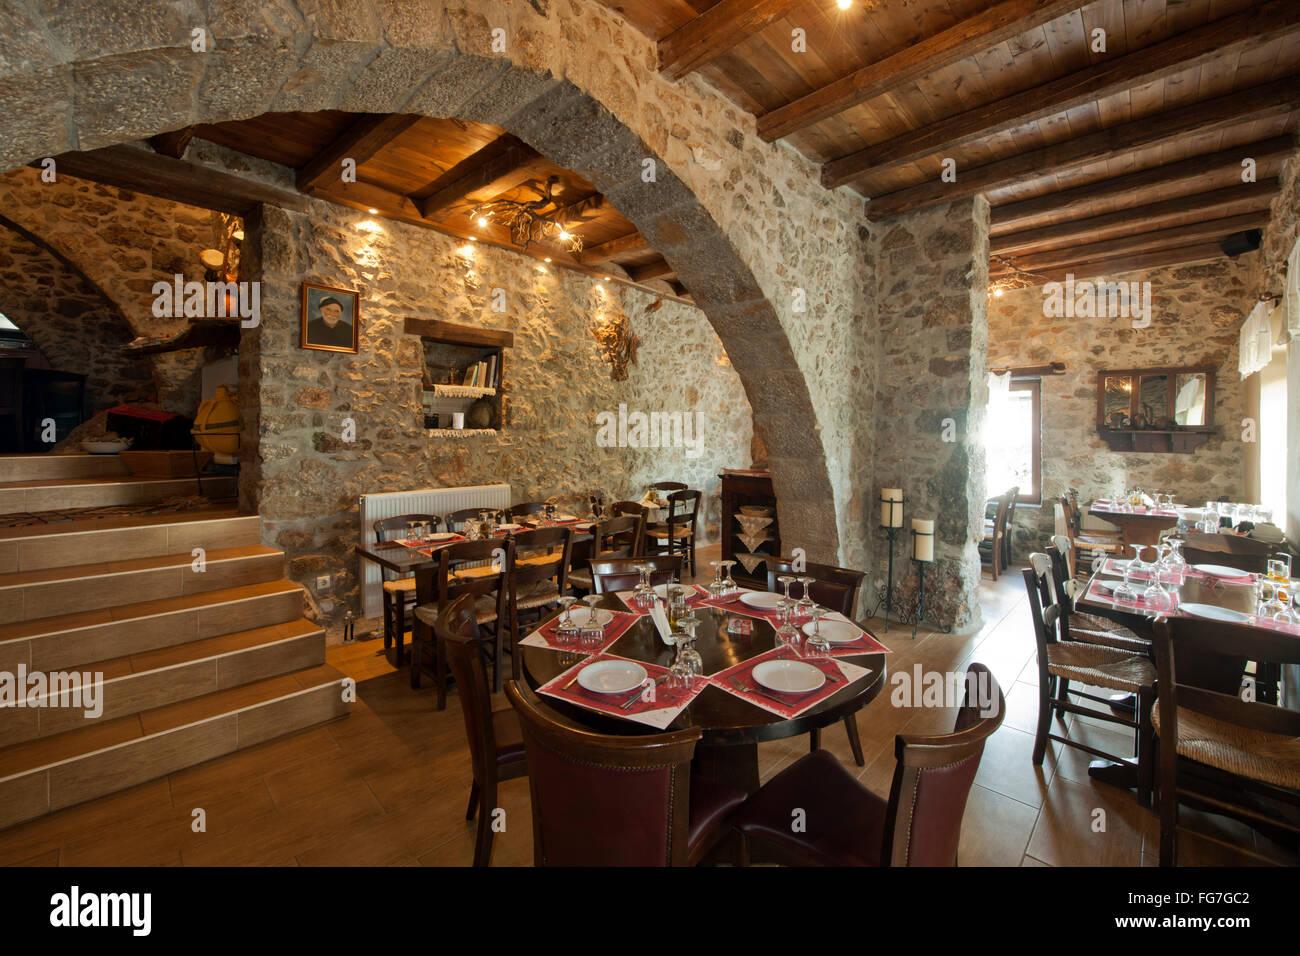 Griechenland, Kreta, Lassithi-Hochebene, Agios Konstantinos, Restaurant Vilaeti - Stock Image